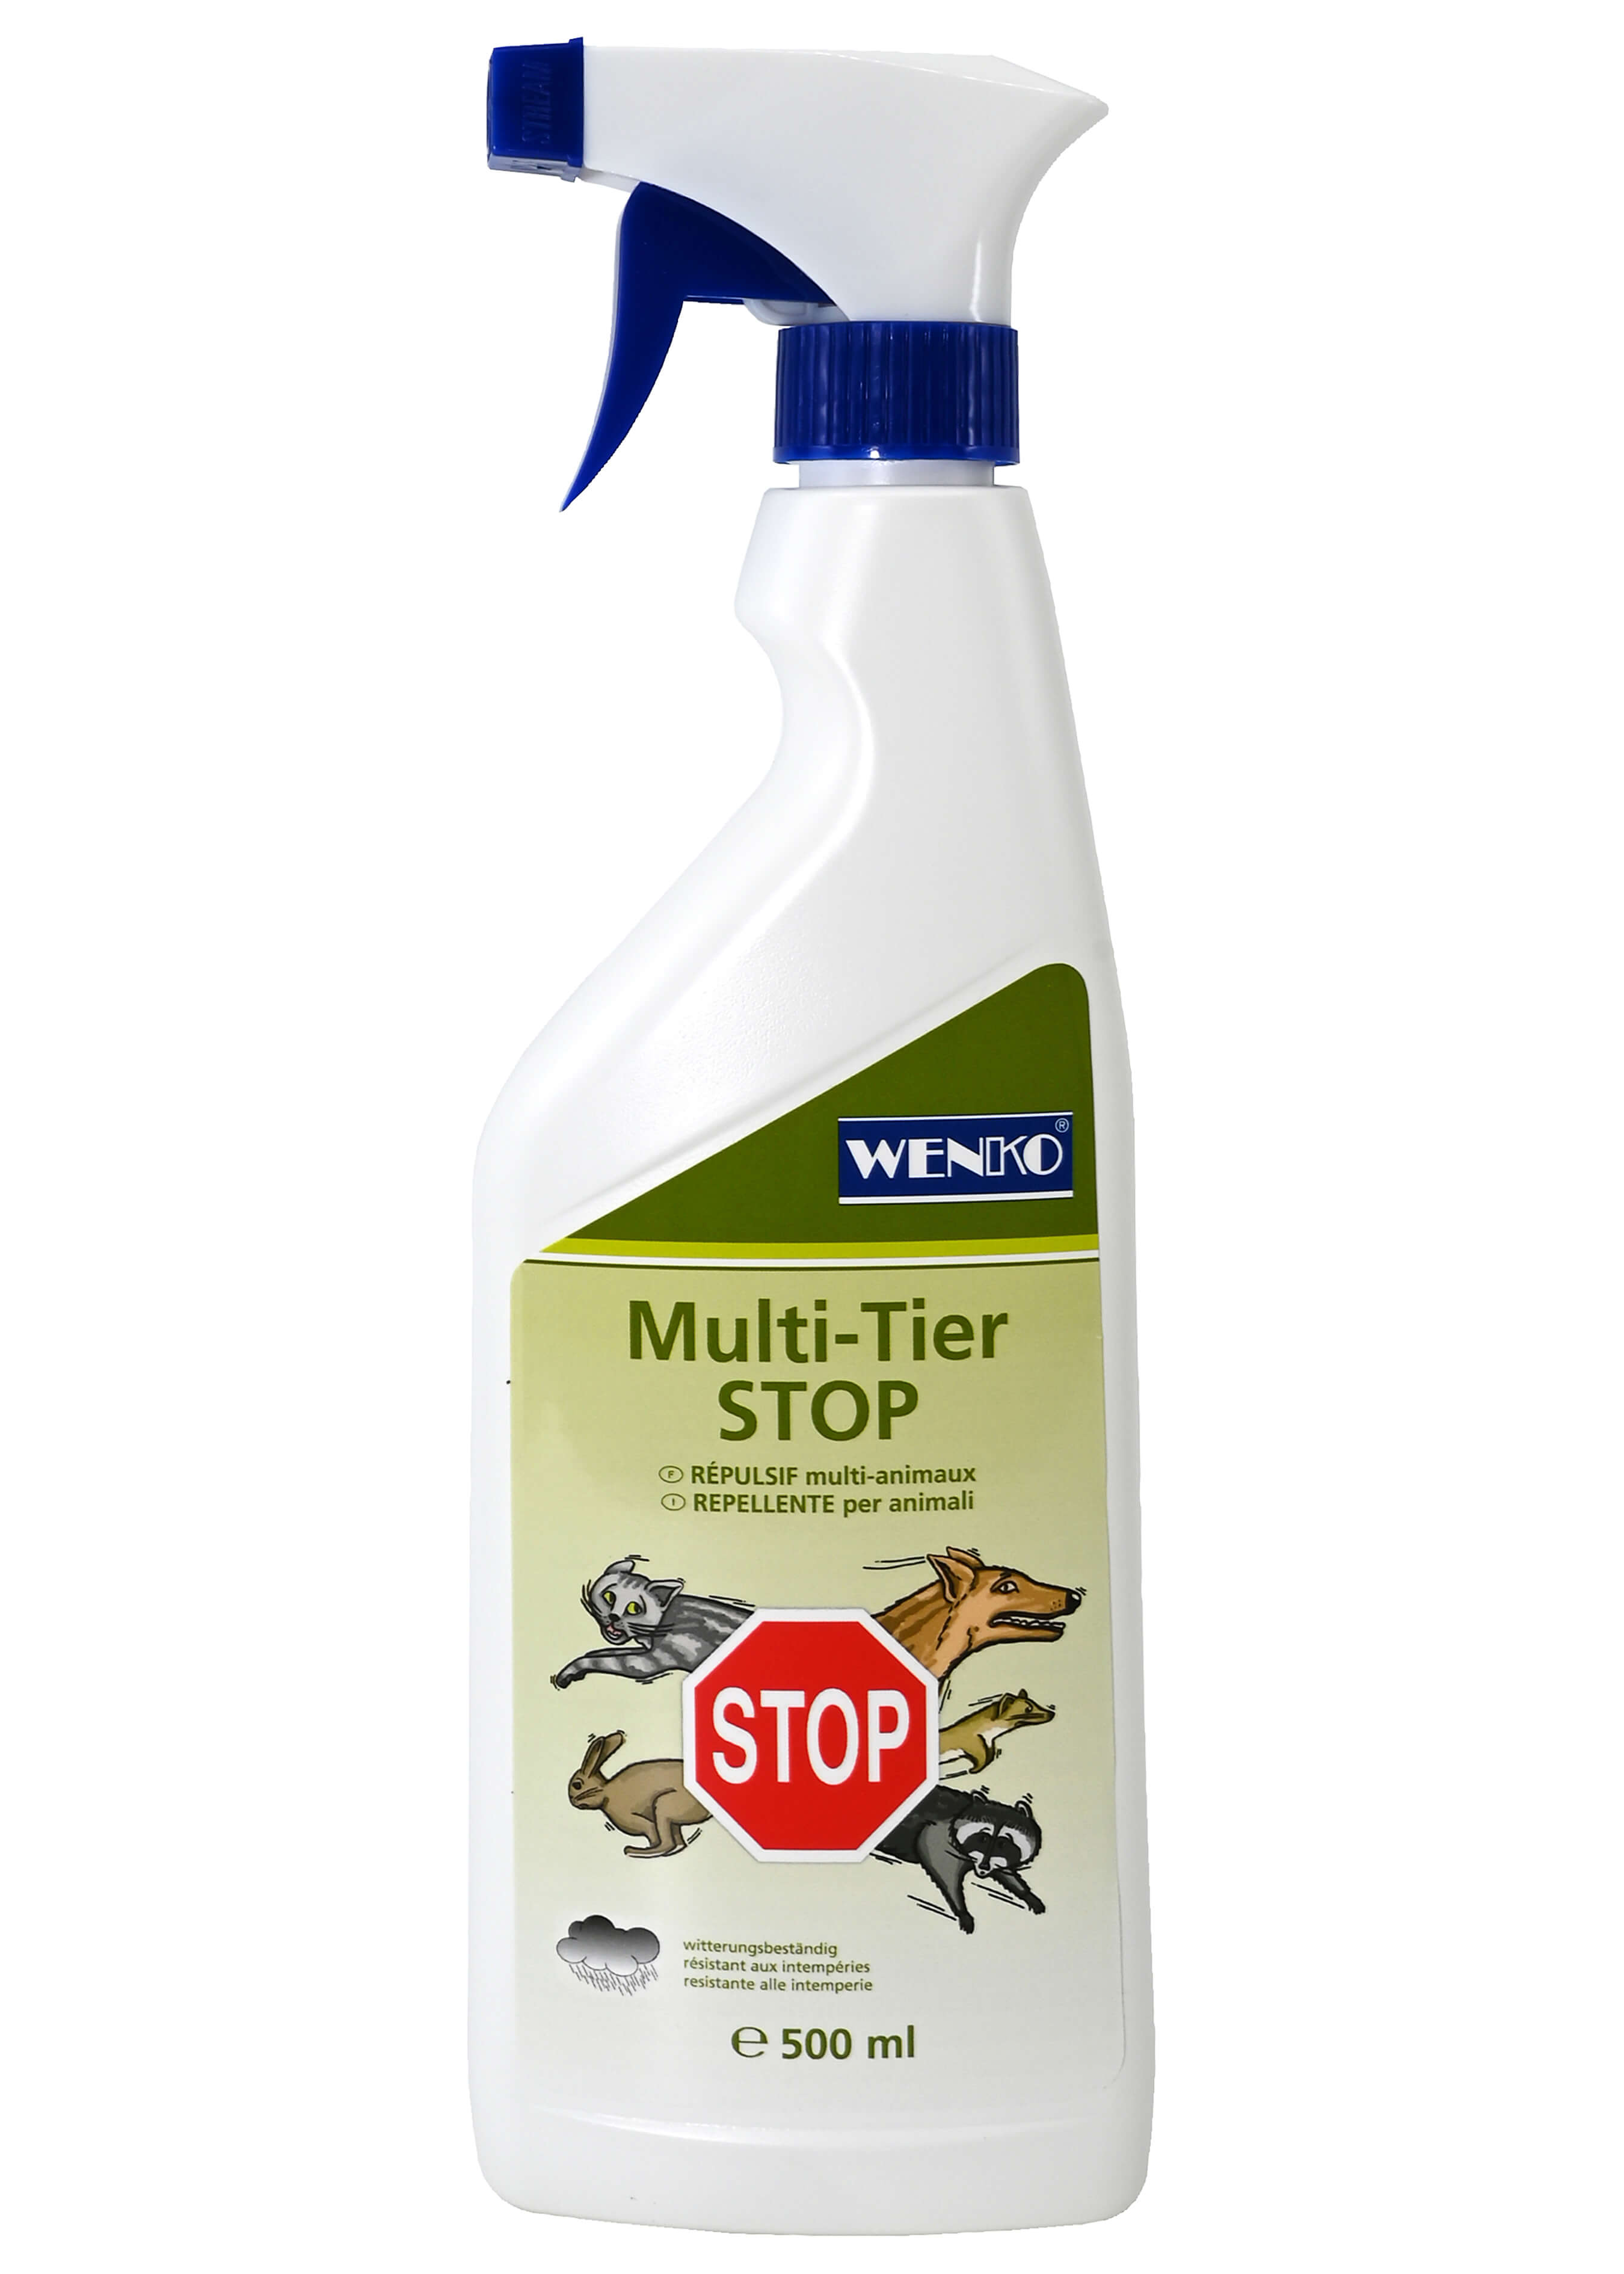 Wenko Multi-Tier-Stop L2235 1